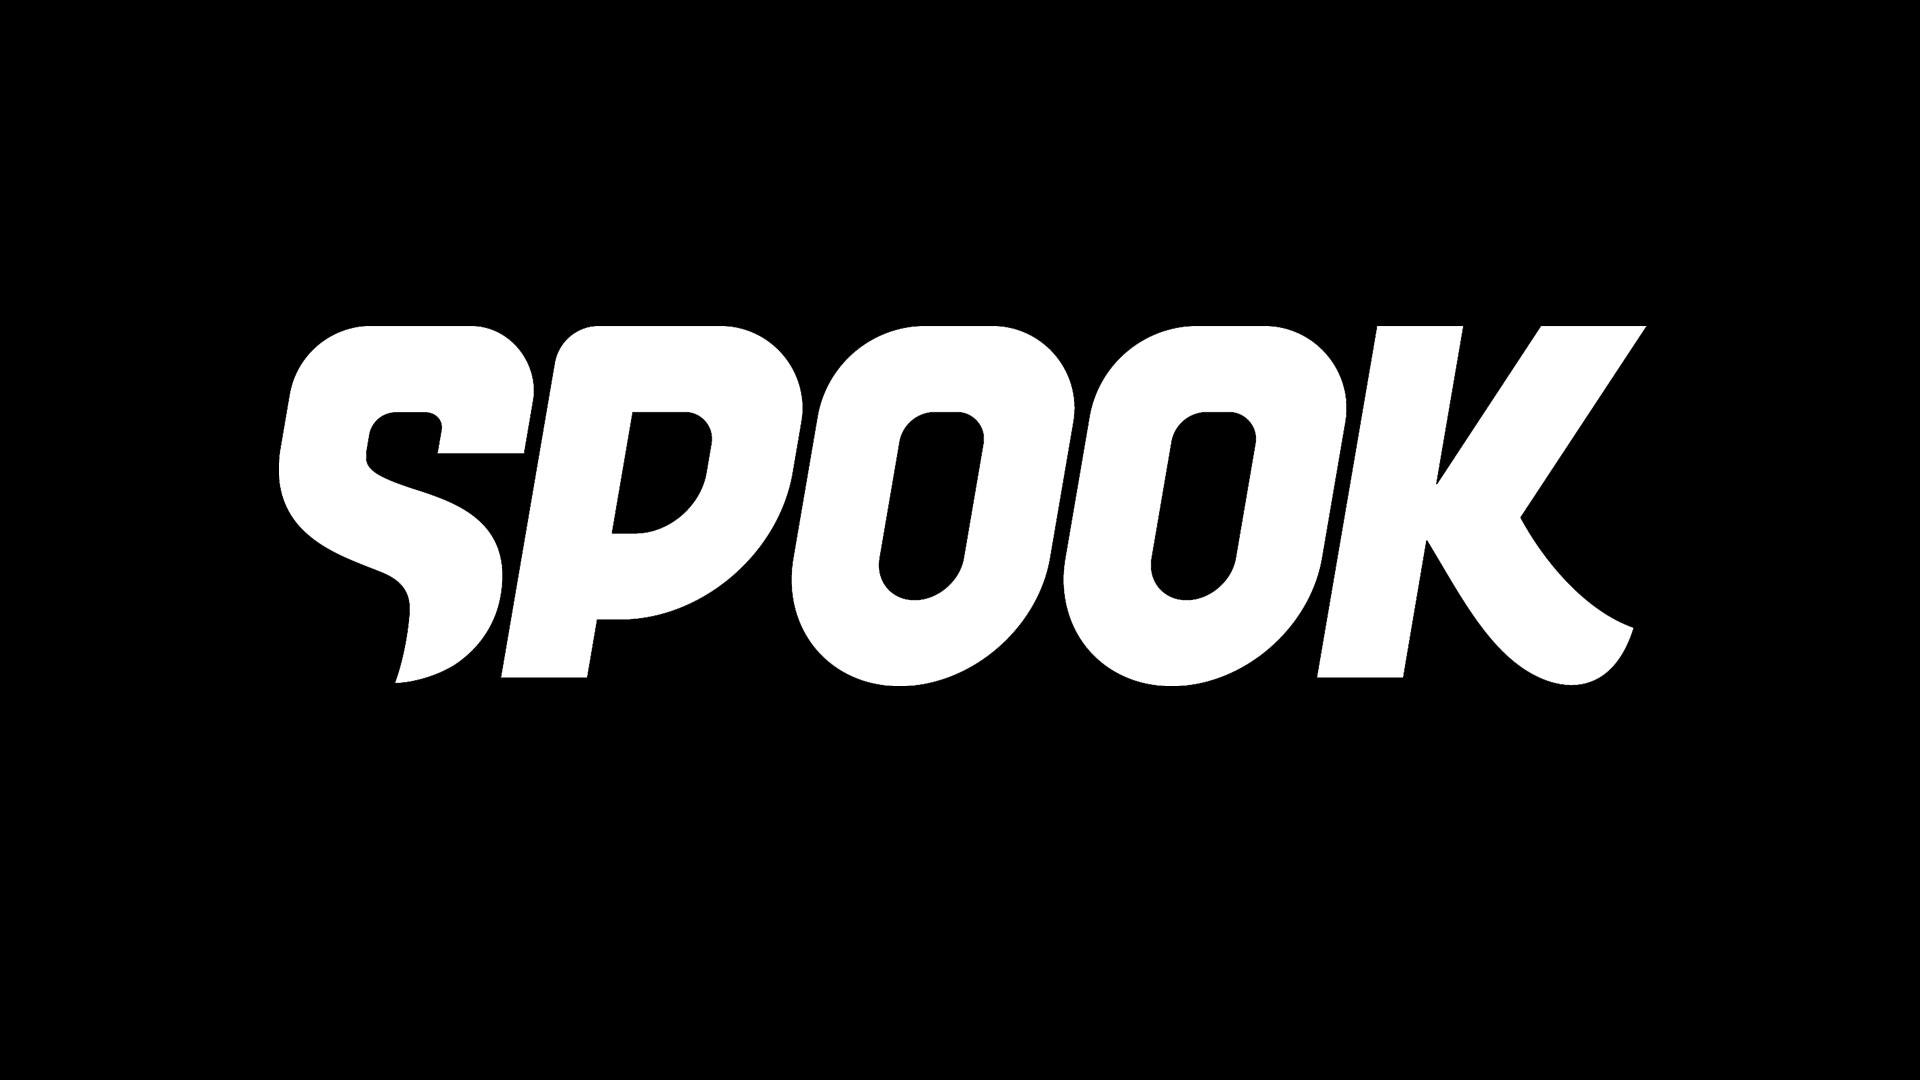 SpookVerb - SPOOK